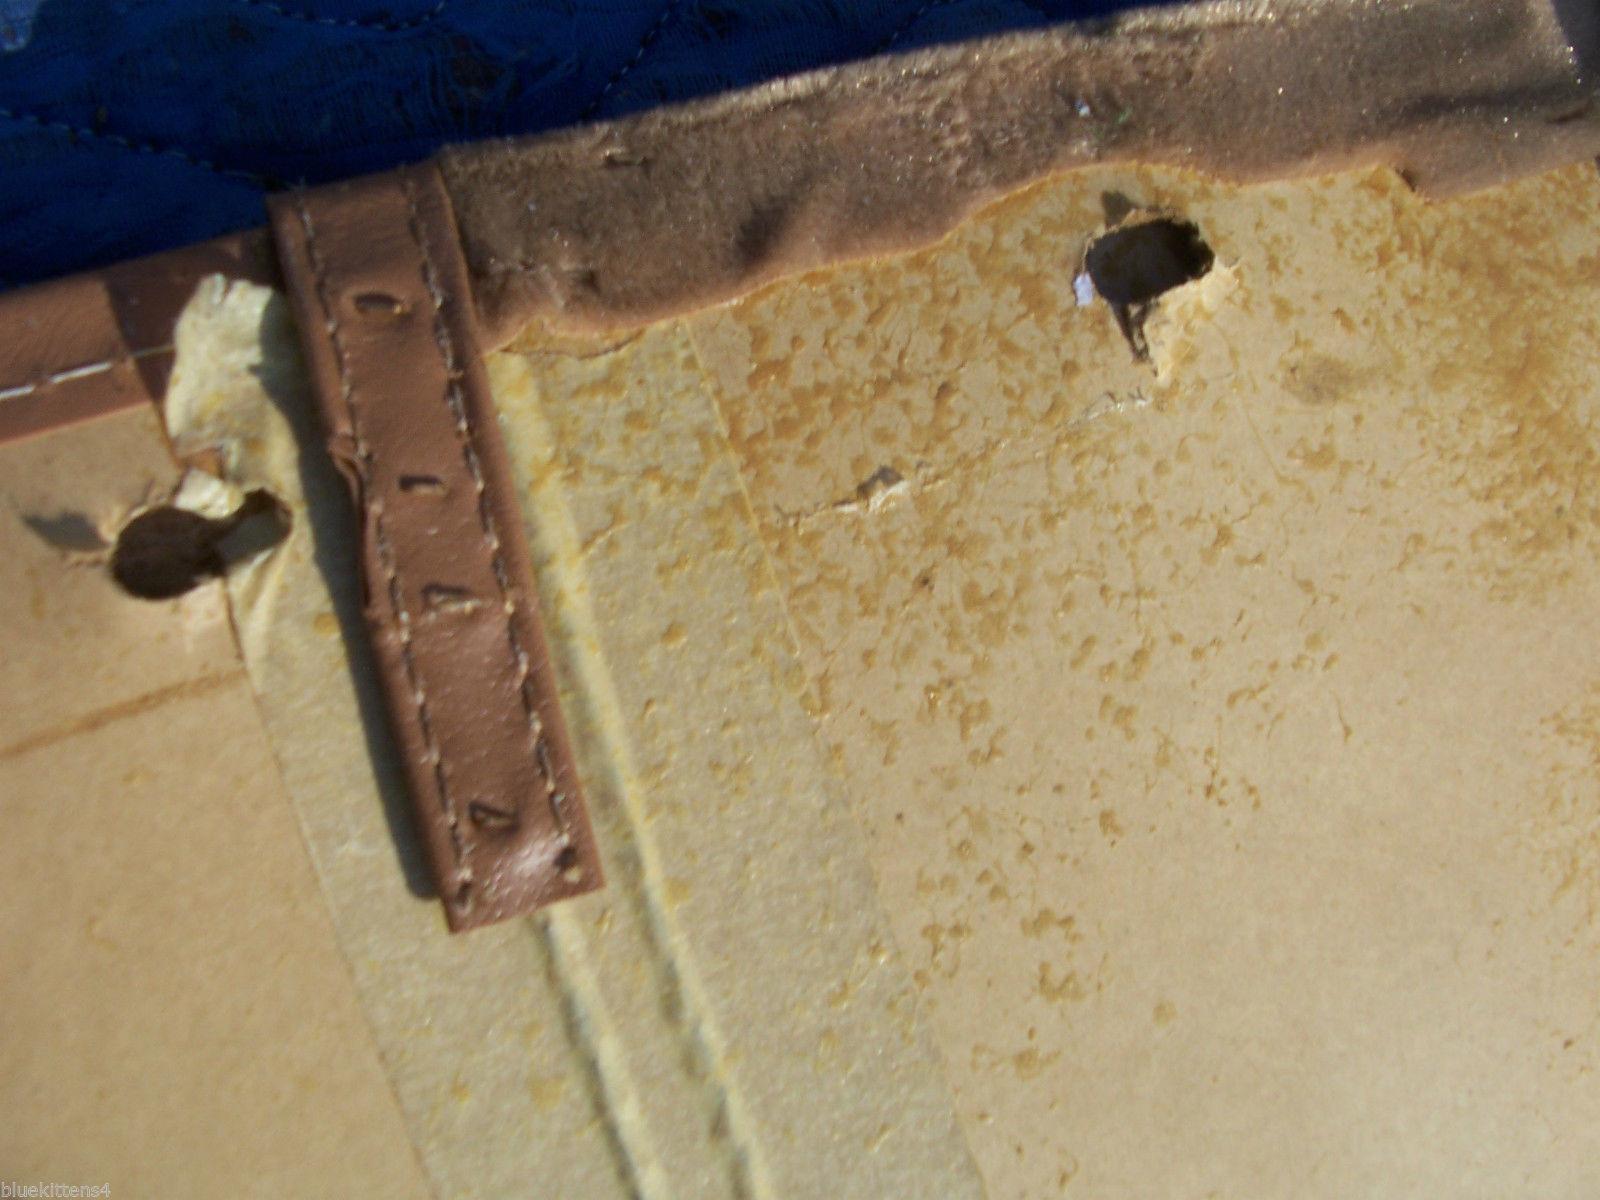 1990 CHEVY CAPRICE ESTATE WAGON DOOR PANEL LEFT REAR USED OEM CHEVROLET PART